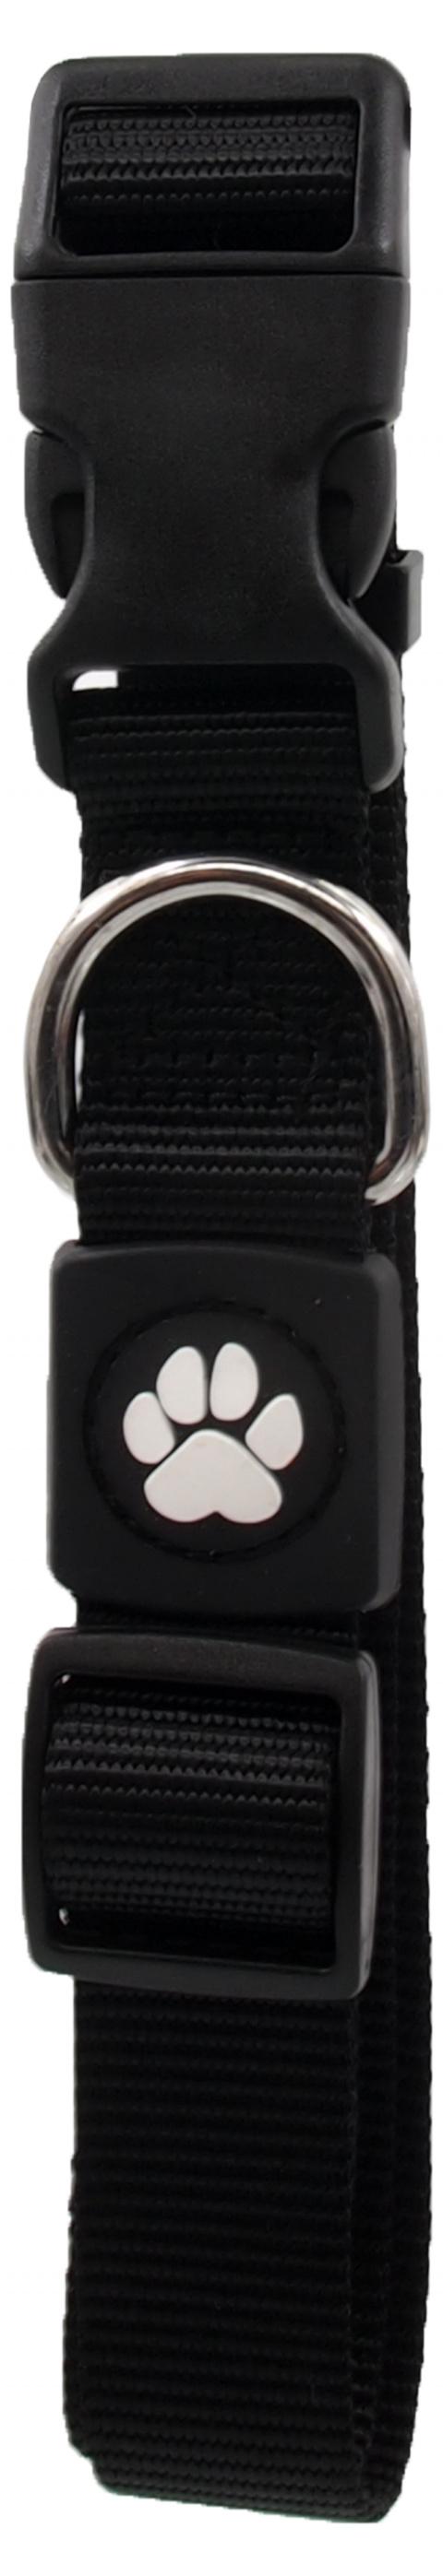 Obojek Active Dog Premium L černý 2,5x45-68cm title=